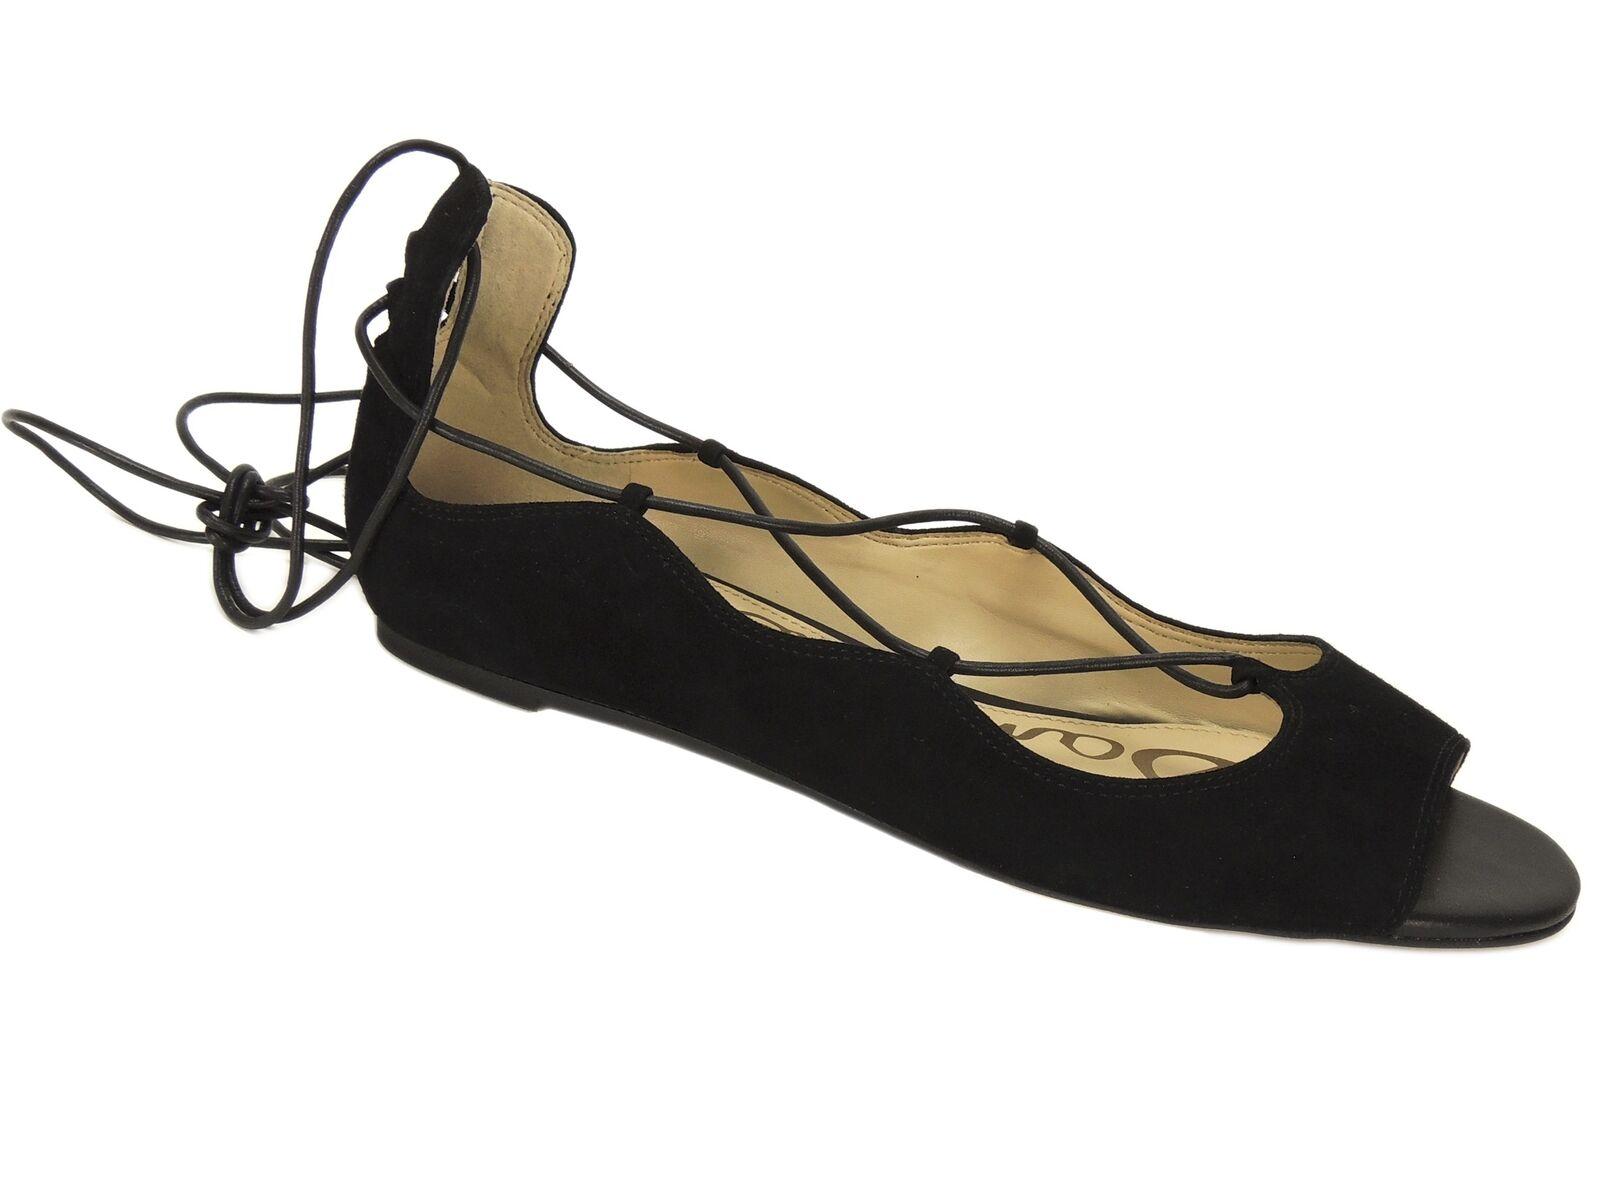 Sam Edelman Women's Barbara Peep Toe Ghillie Flats Flats Flats Black Suede Size 10 M 7239e9